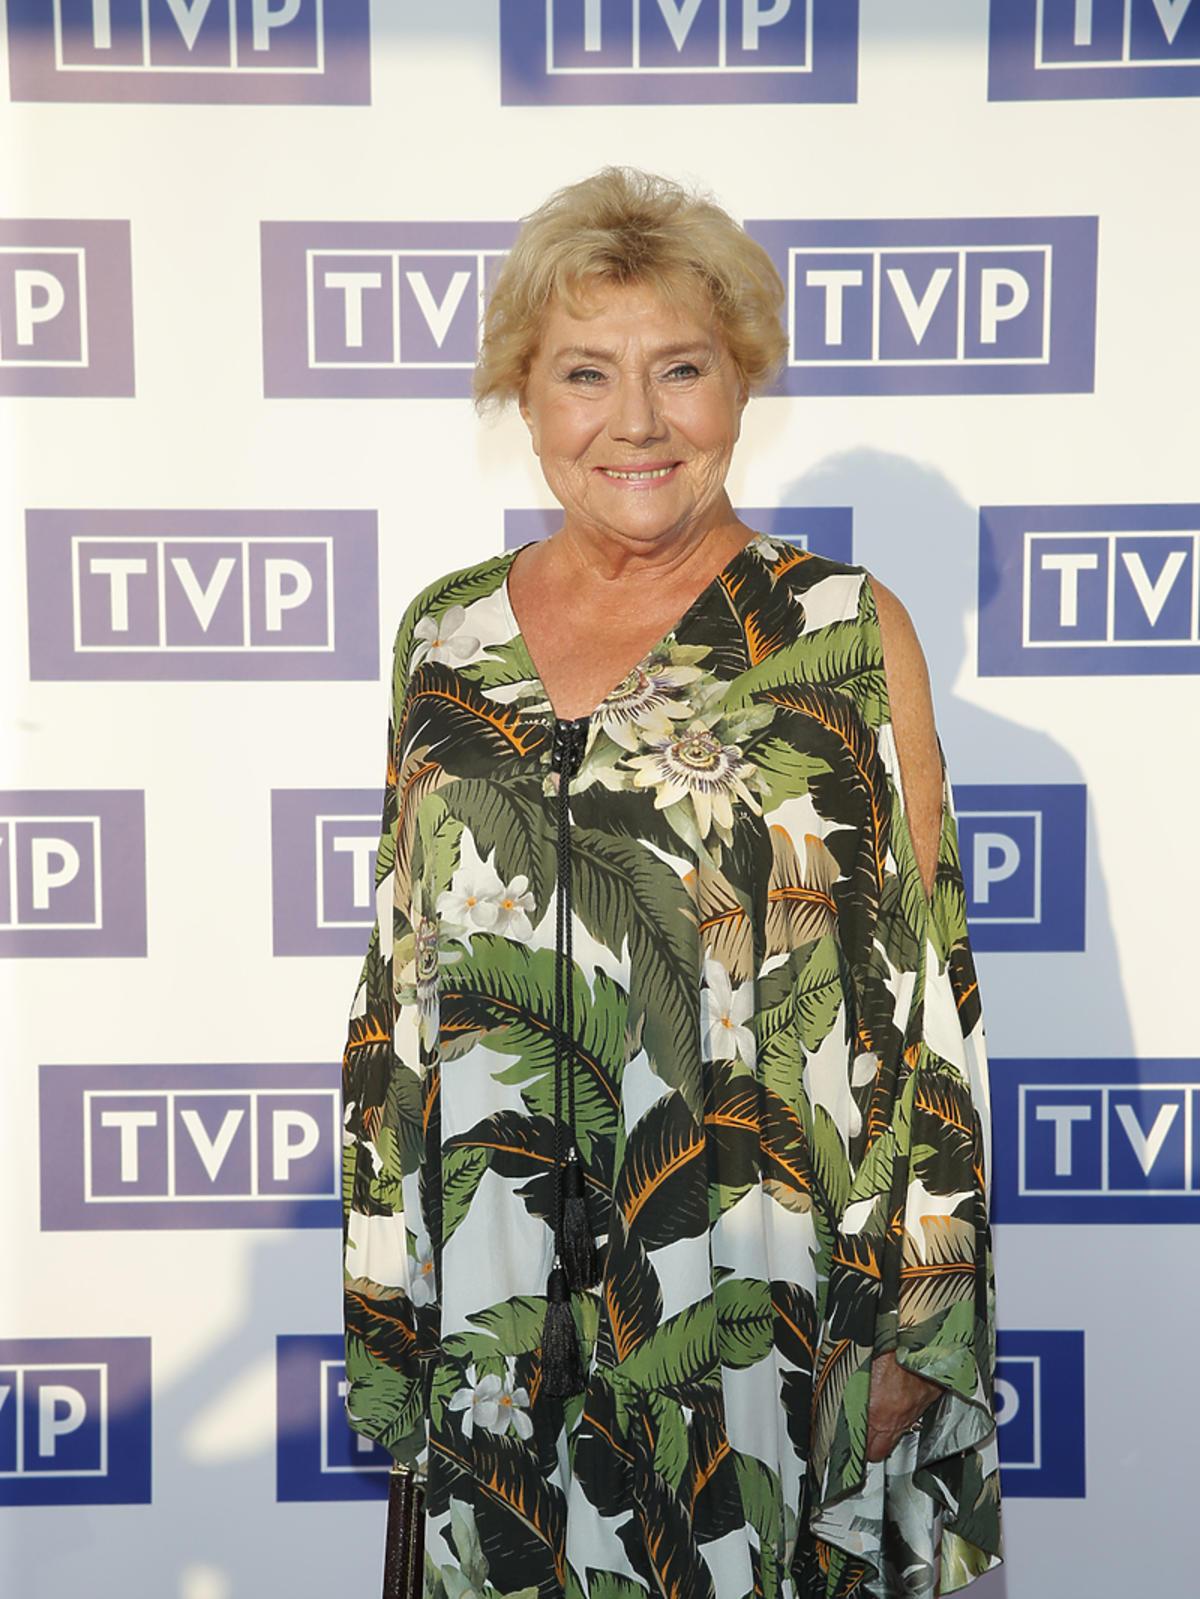 Teresa Lipowska upadła na ramówce TVP